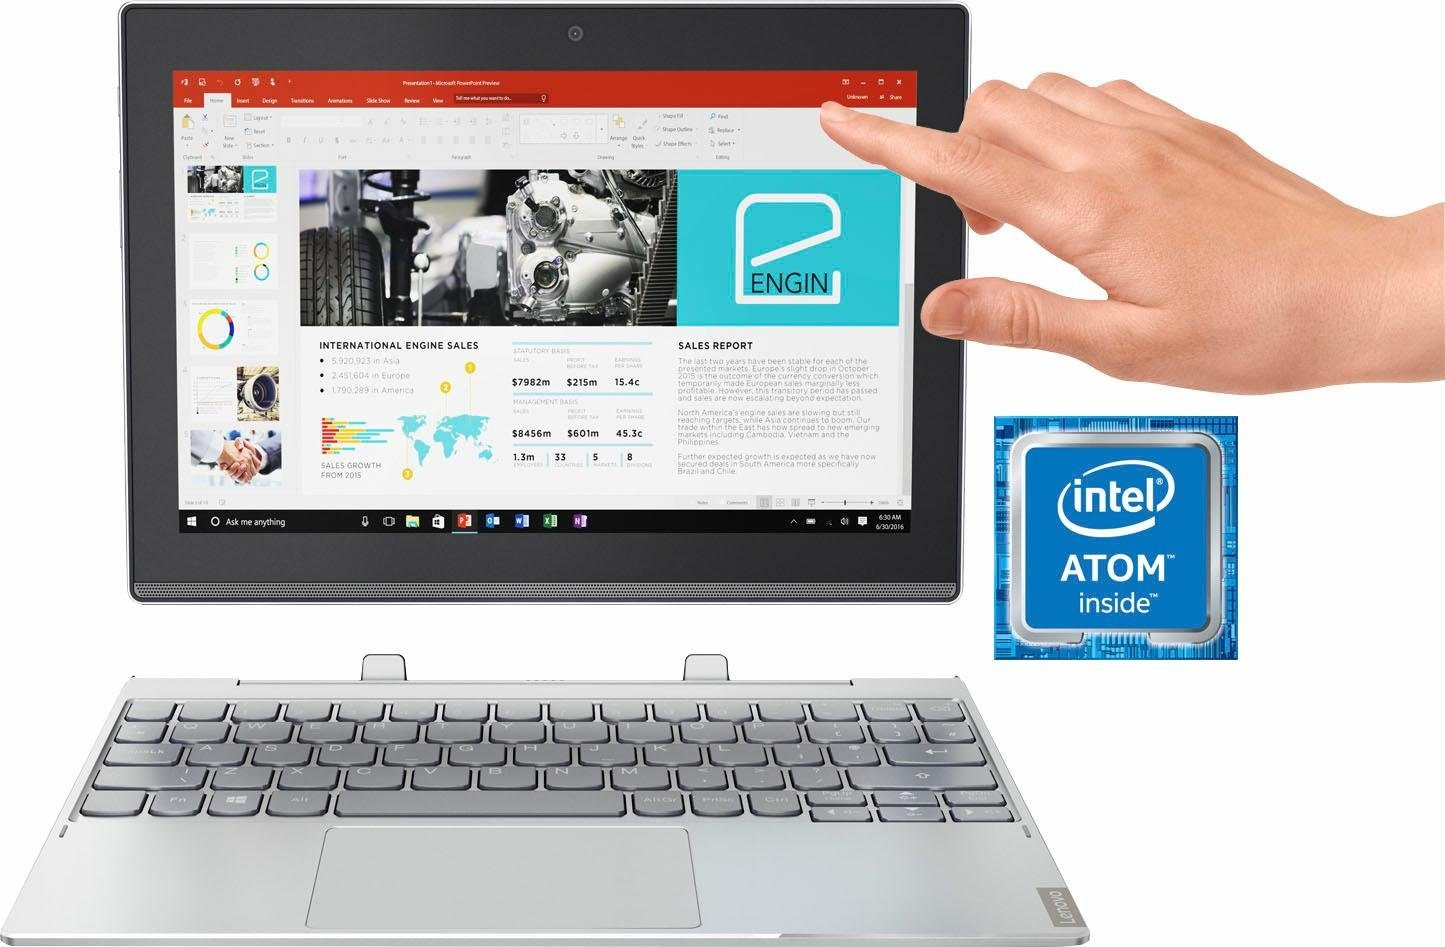 Lenovo MIIX 320-10ICR 80XF001VGE Convertible Notebook (25,7 cm/10,1 Zoll, Intel Atom, HD Graphics)